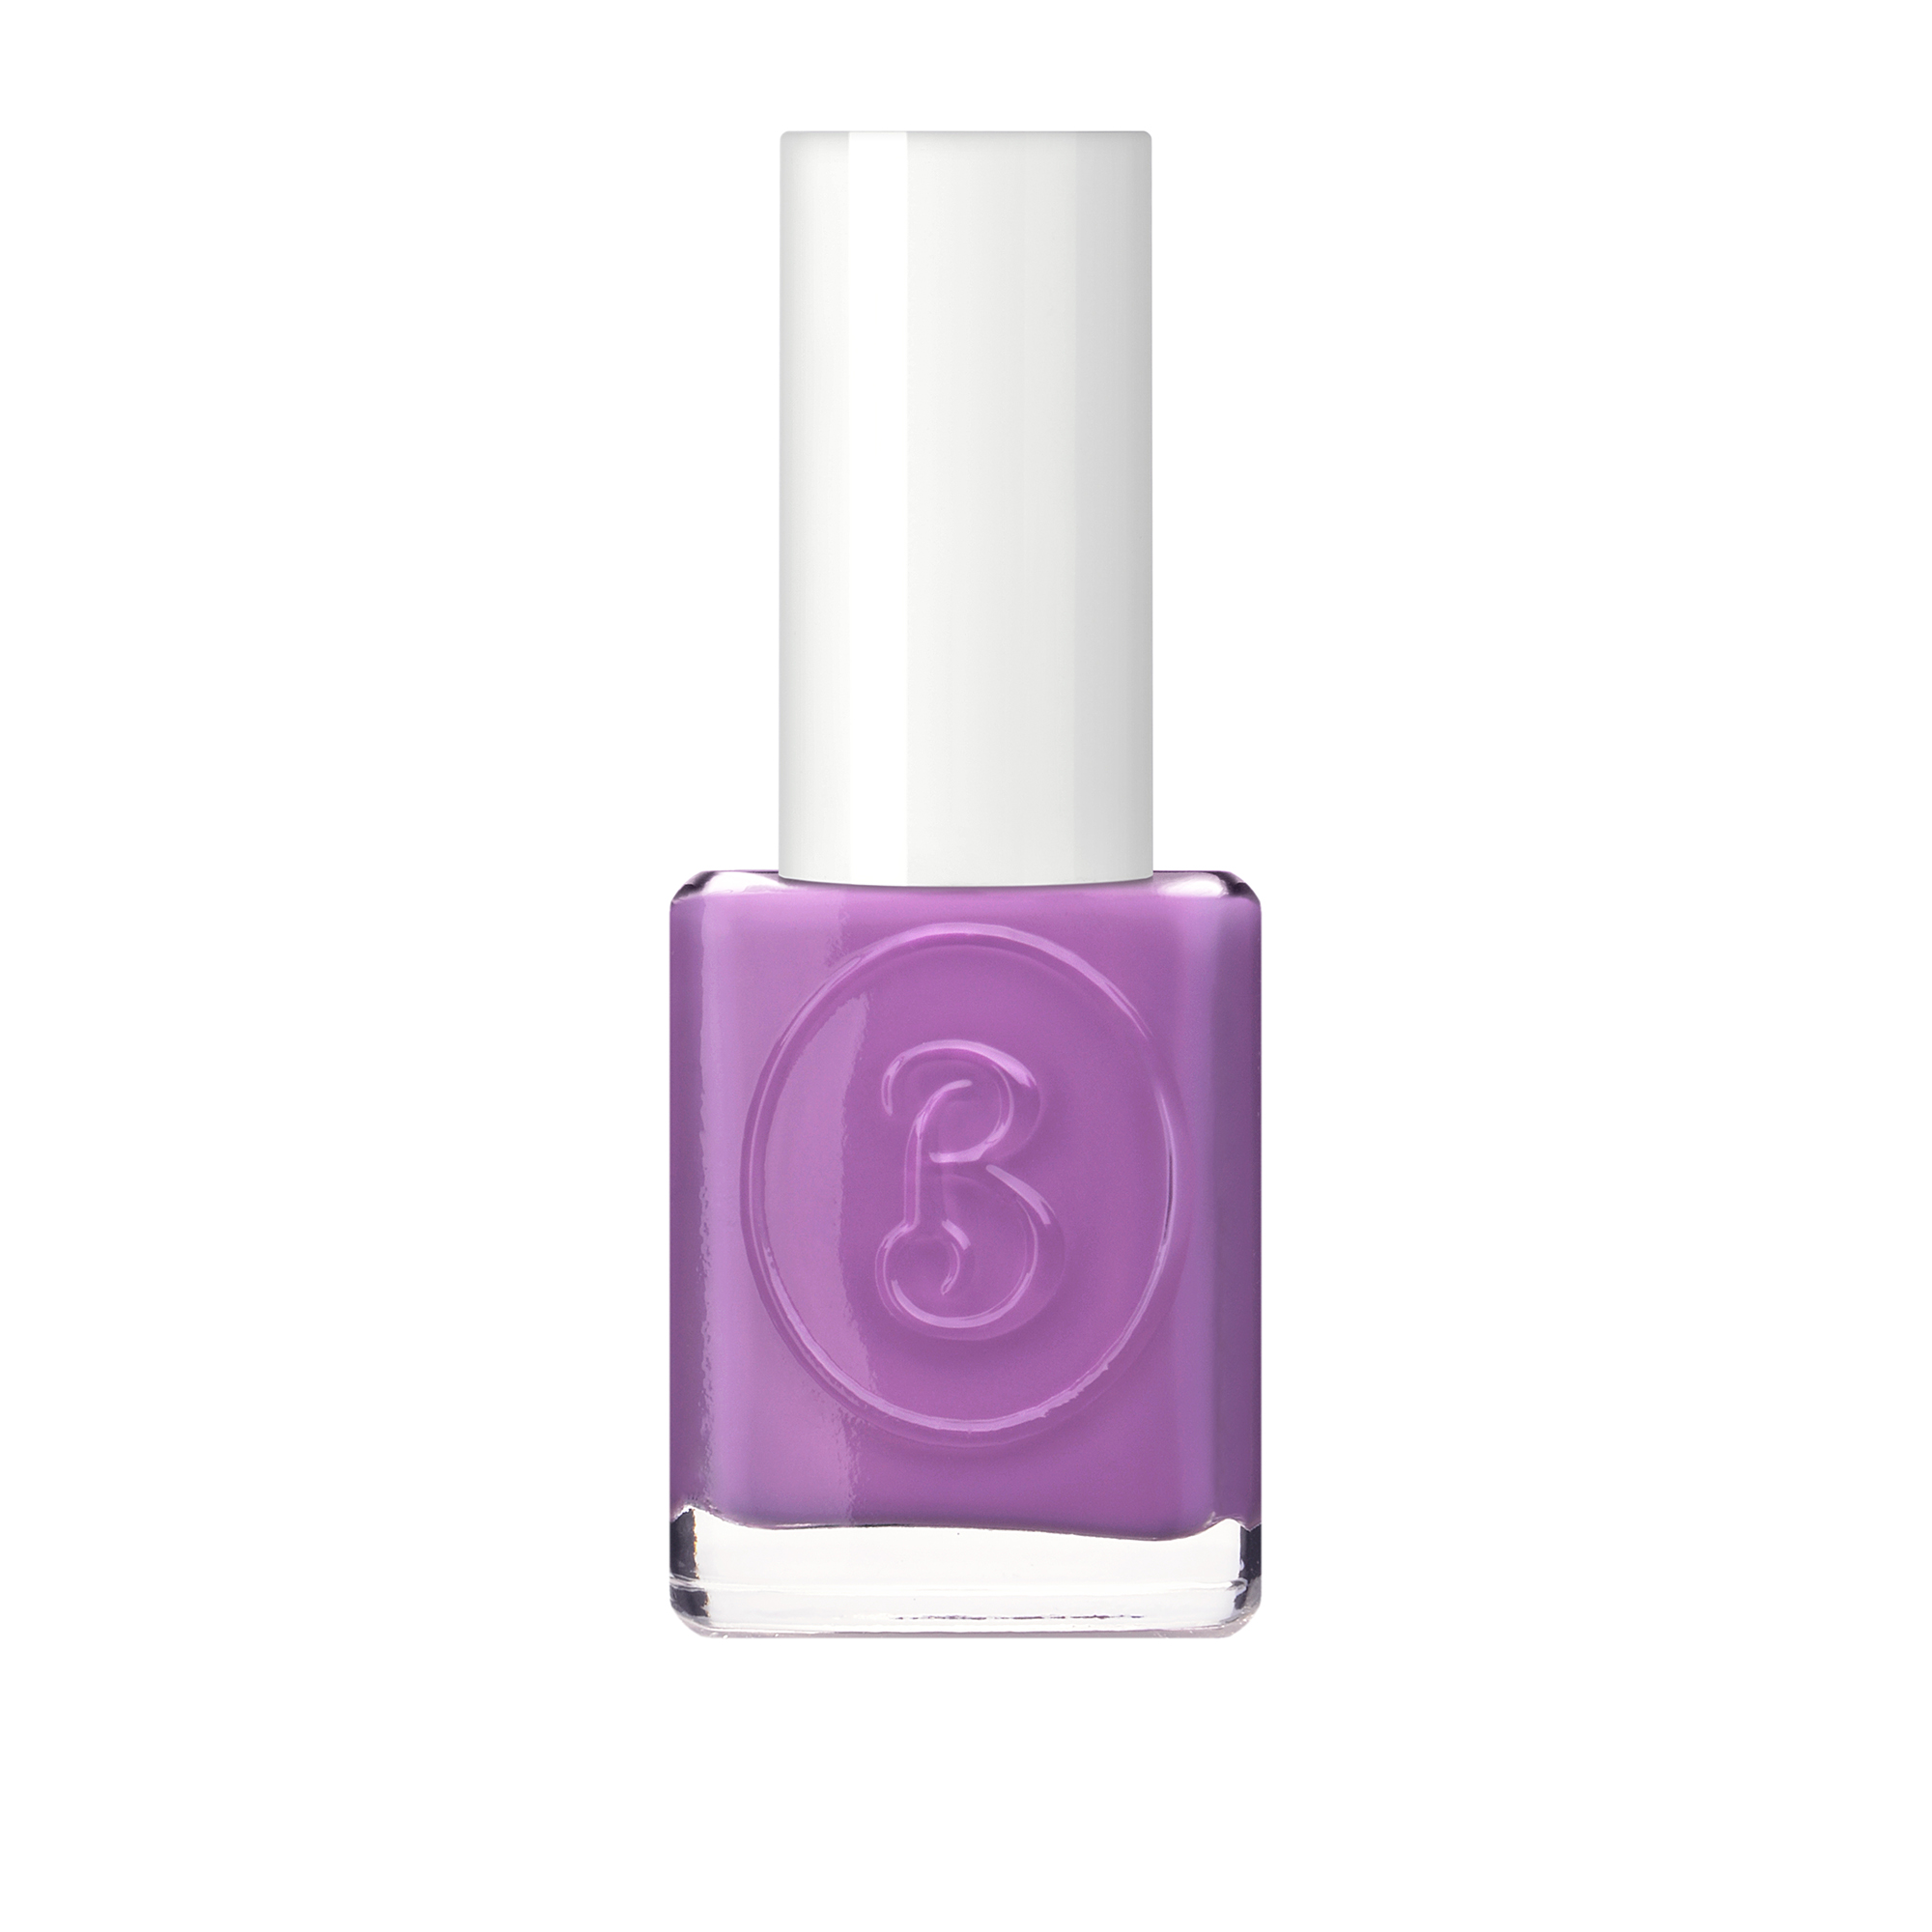 BERENICE 18 лак для ногтей, светло фиолетовый / Light violet 16 мл berenice 53 лак для ногтей рыжая лиса red fox 16 мл